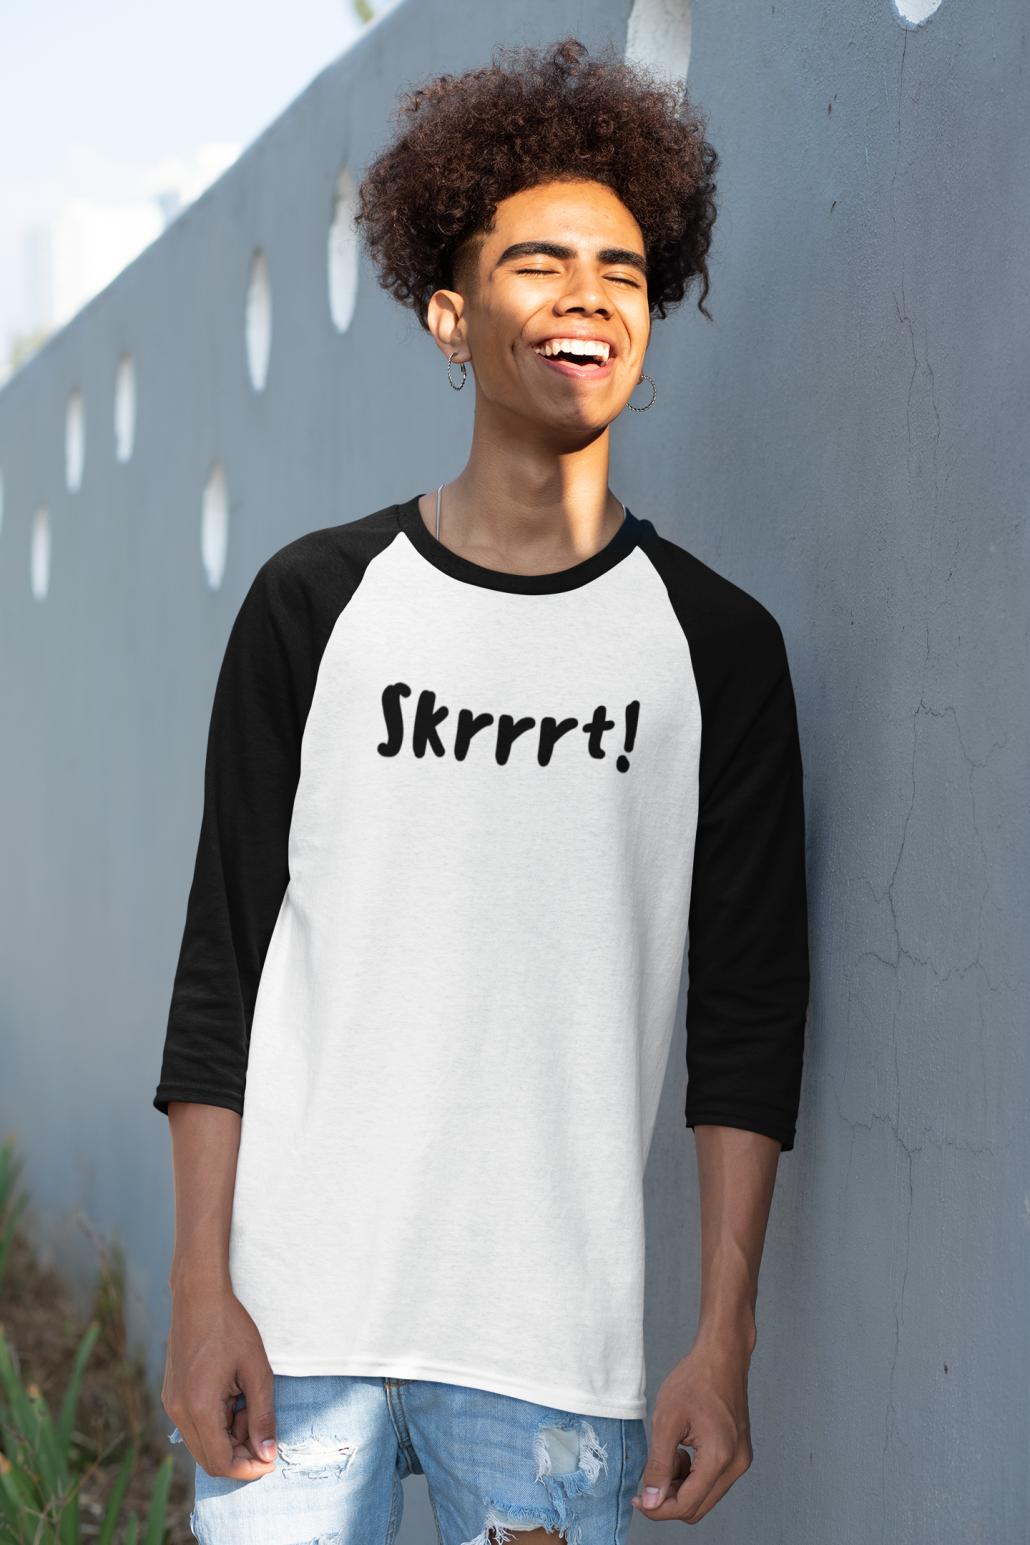 Druck DRap-Zitat auf Shirt. Skrrrt!